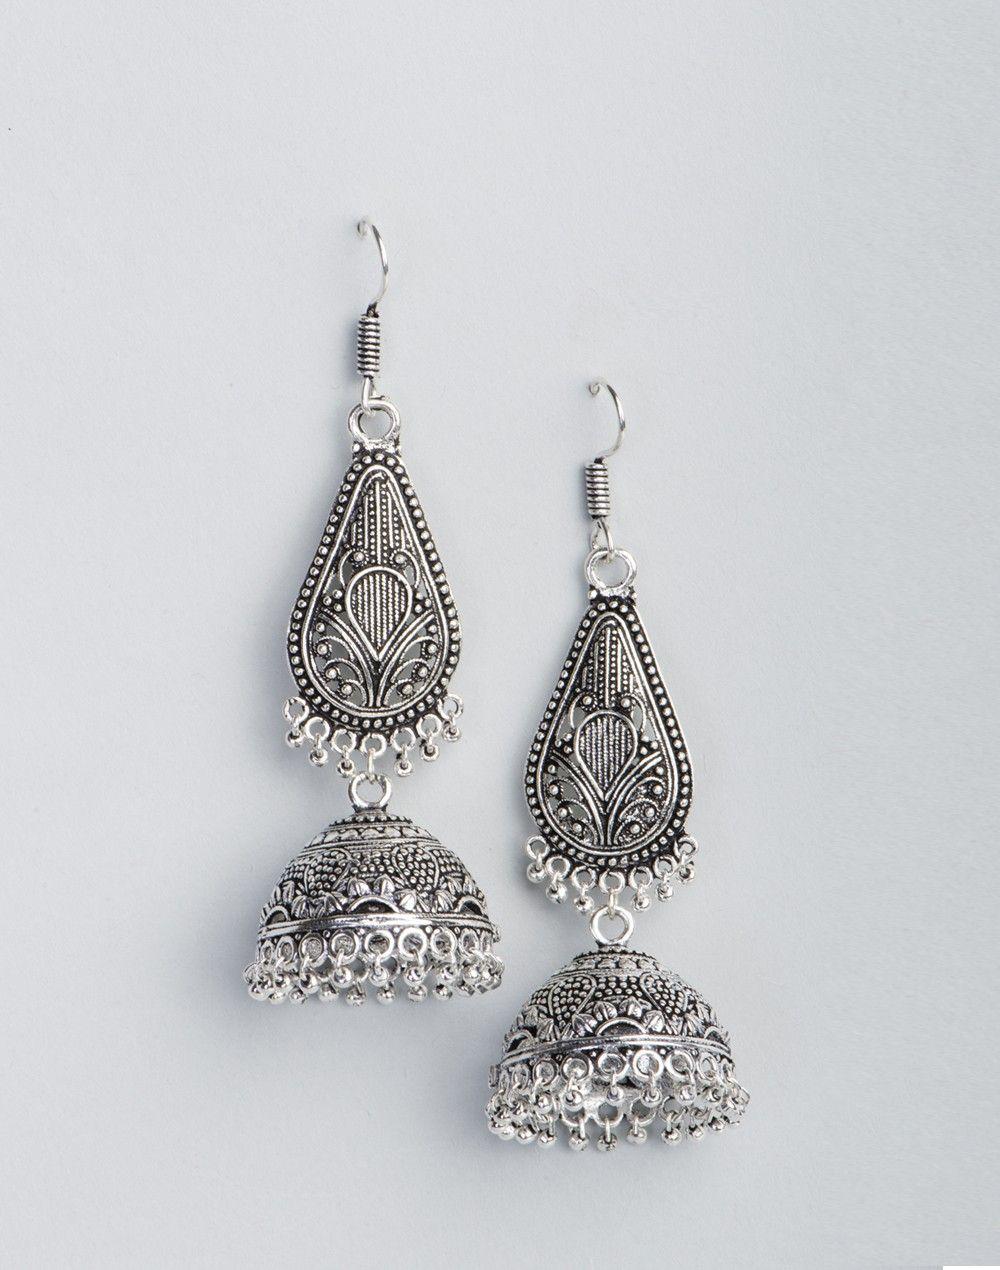 c3c986b68 Metal Anusuya EM 290 Jhumka Earrings | Indian Jewellery | Jewelry ...